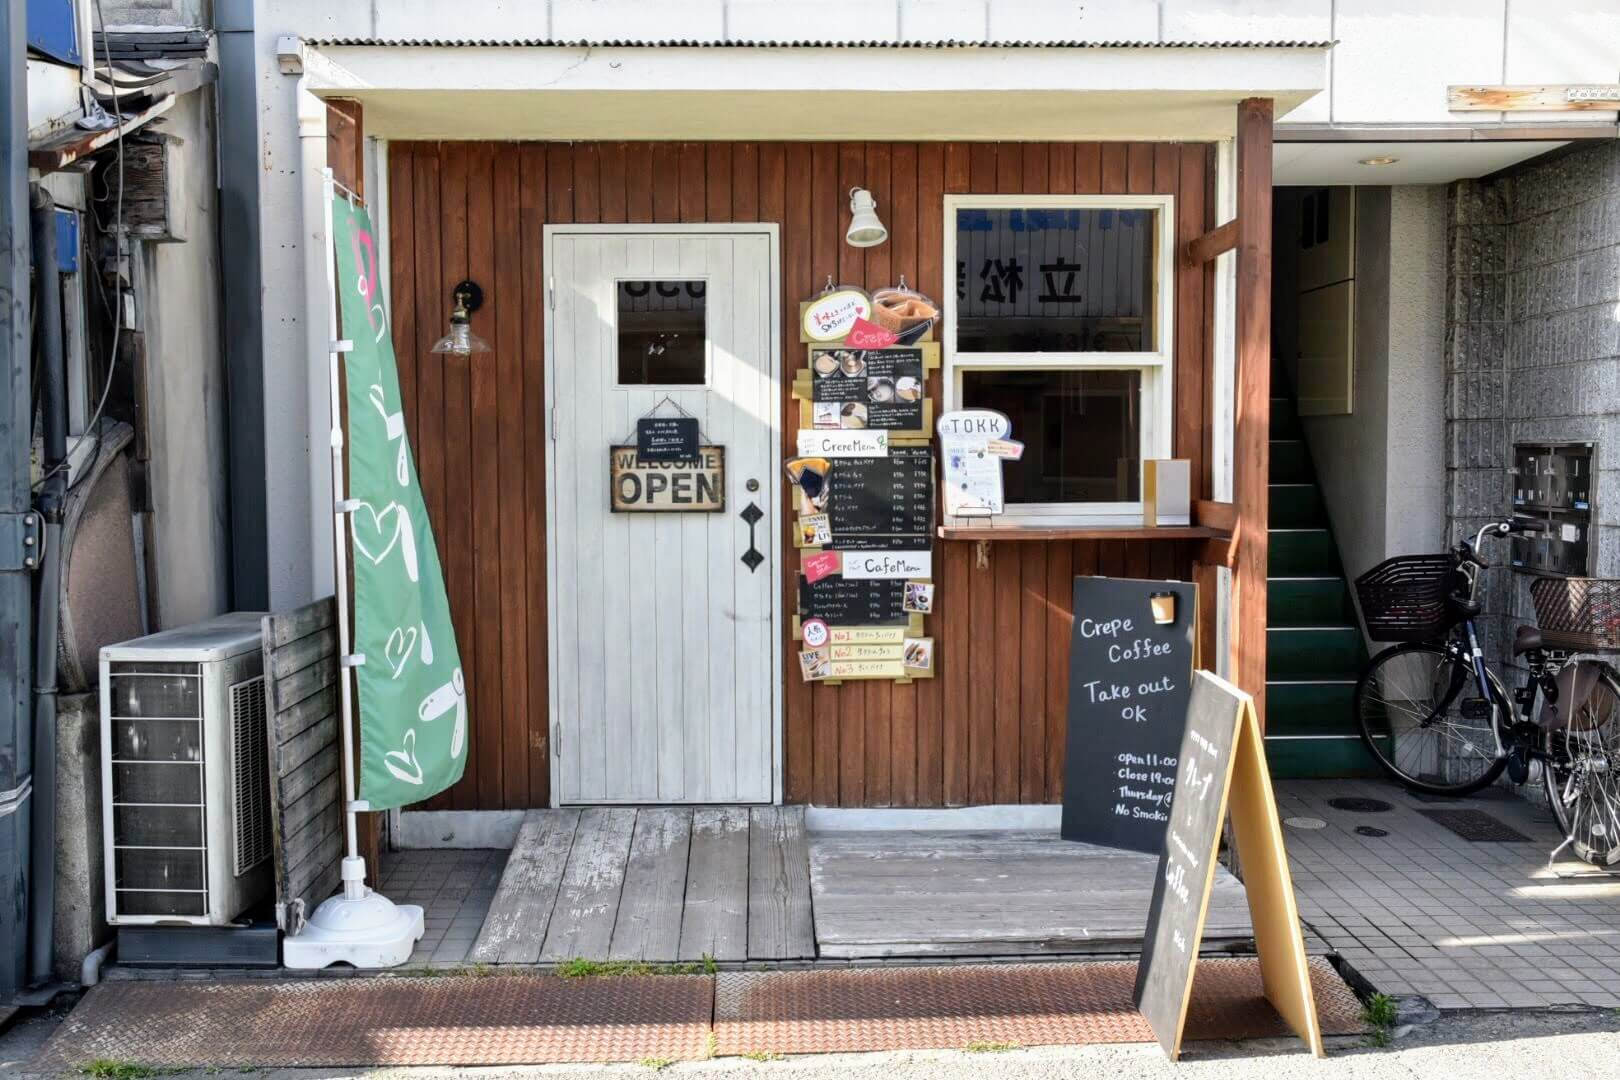 sri cafe(シュリーカフェ)の店前